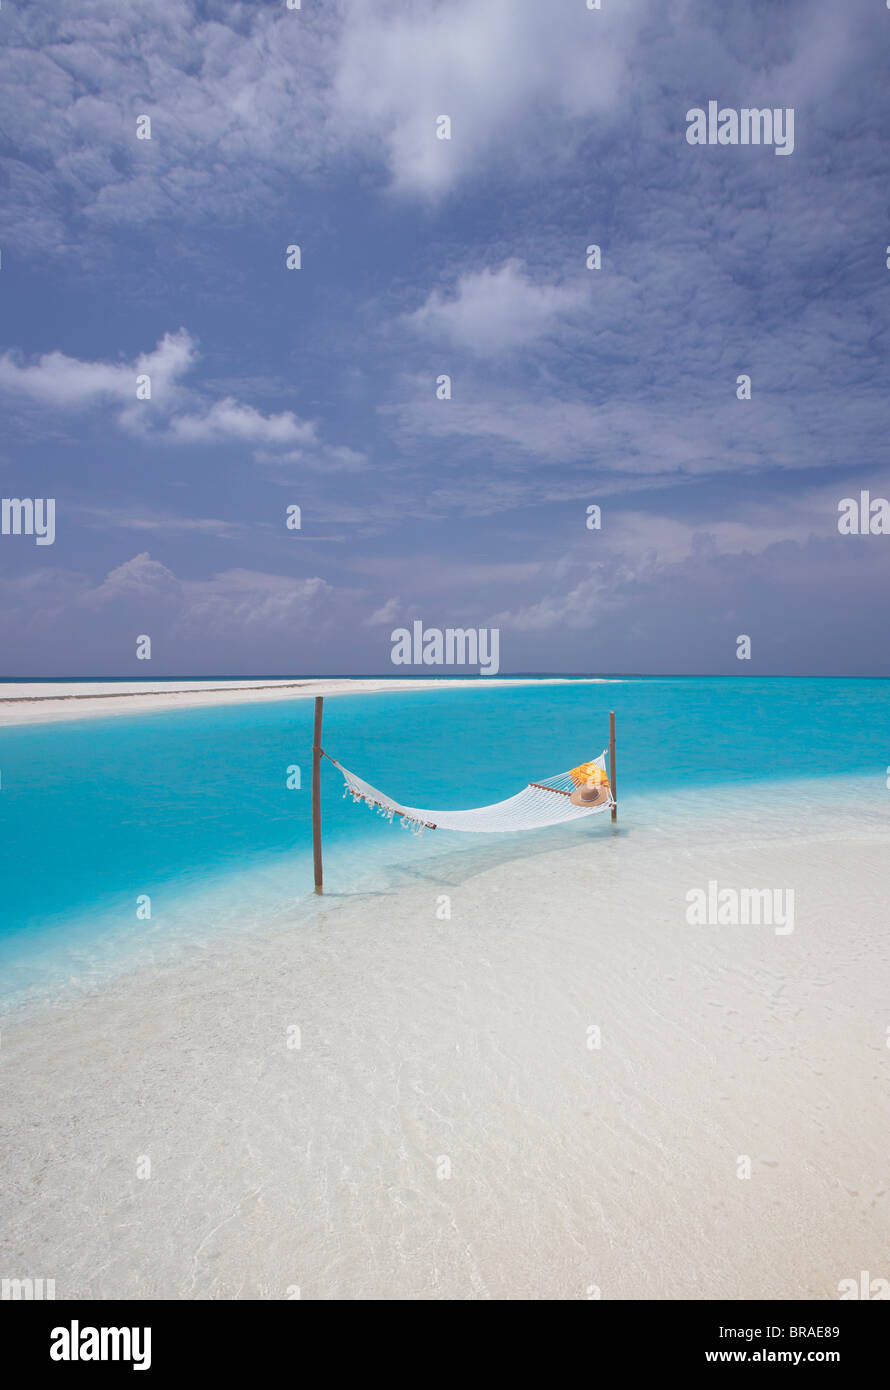 Hammock on the edge of beach, Maldives, Indian Ocean, Asia - Stock Image